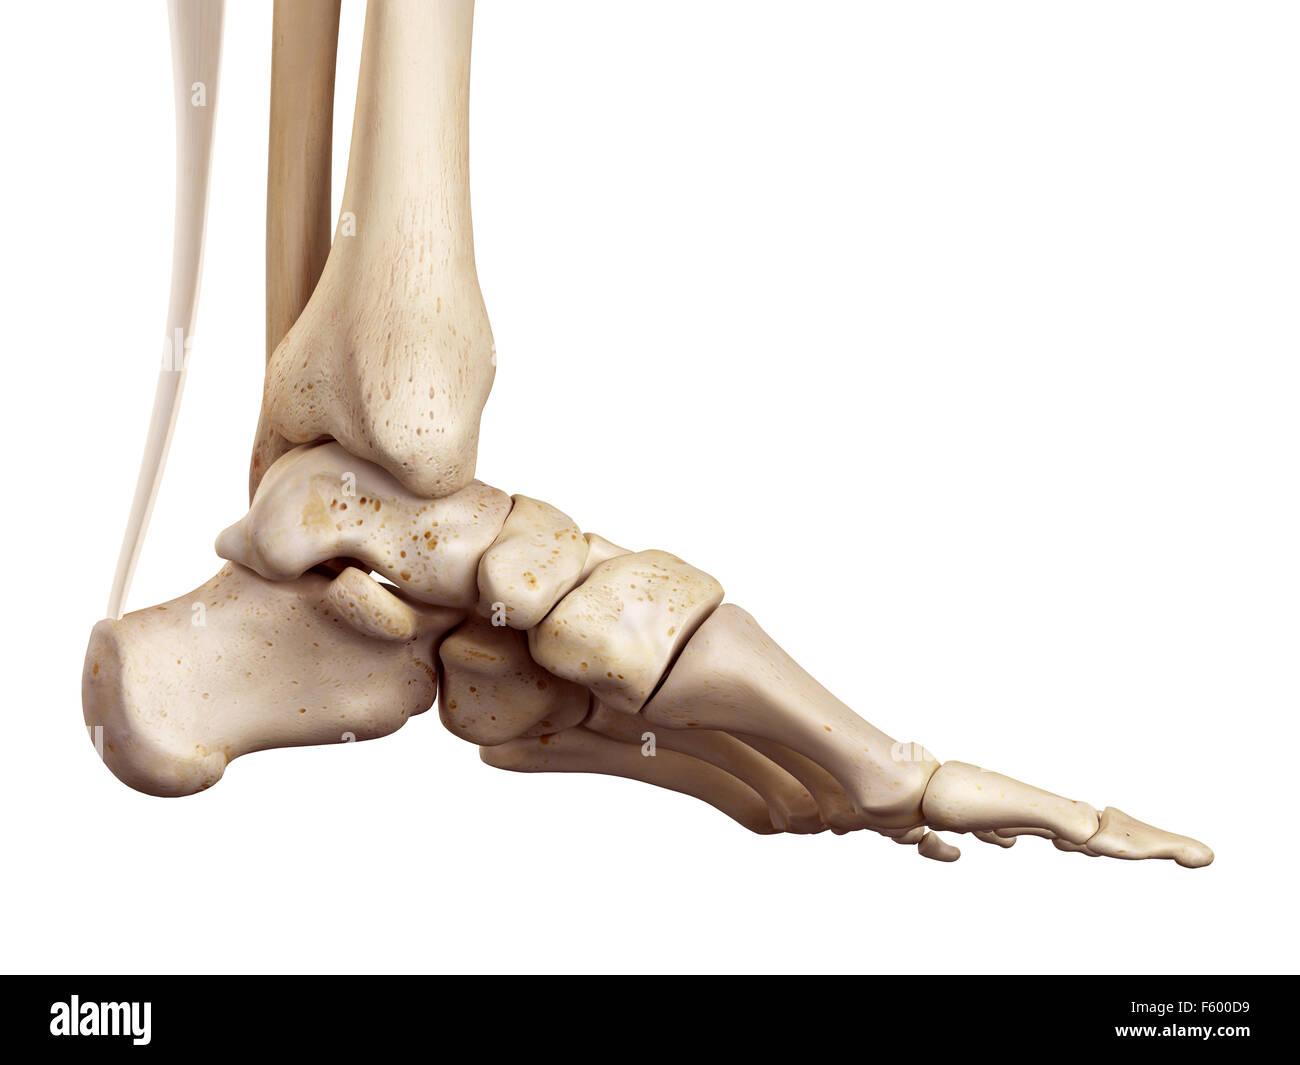 Toe Medical Stockfotos & Toe Medical Bilder - Alamy